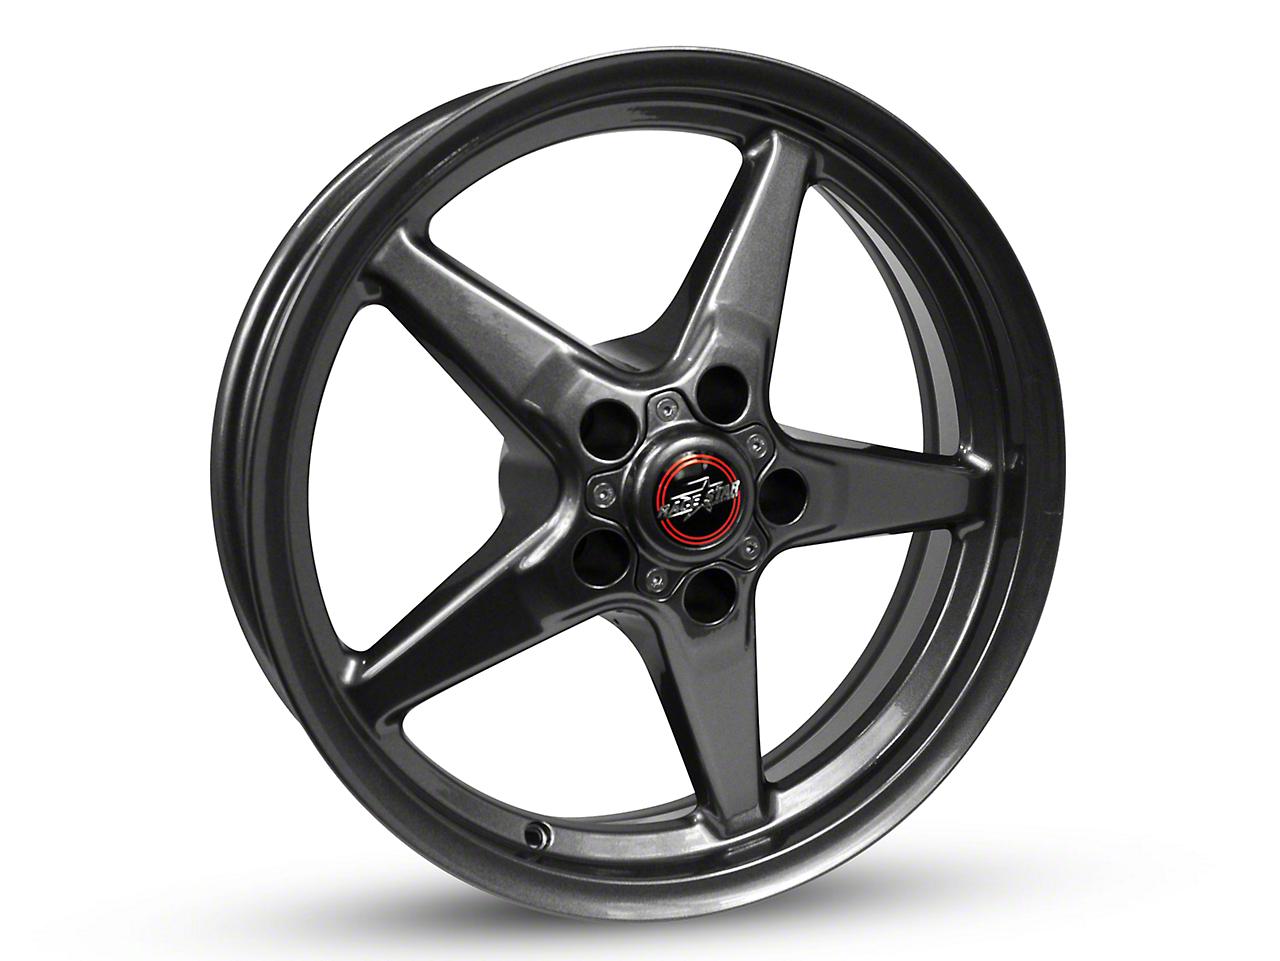 Race Star 92 Drag Star Bracket Racer Metallic Gray Wheel - 15x3.75 (87-93 w/ 5 Lug Conversion)